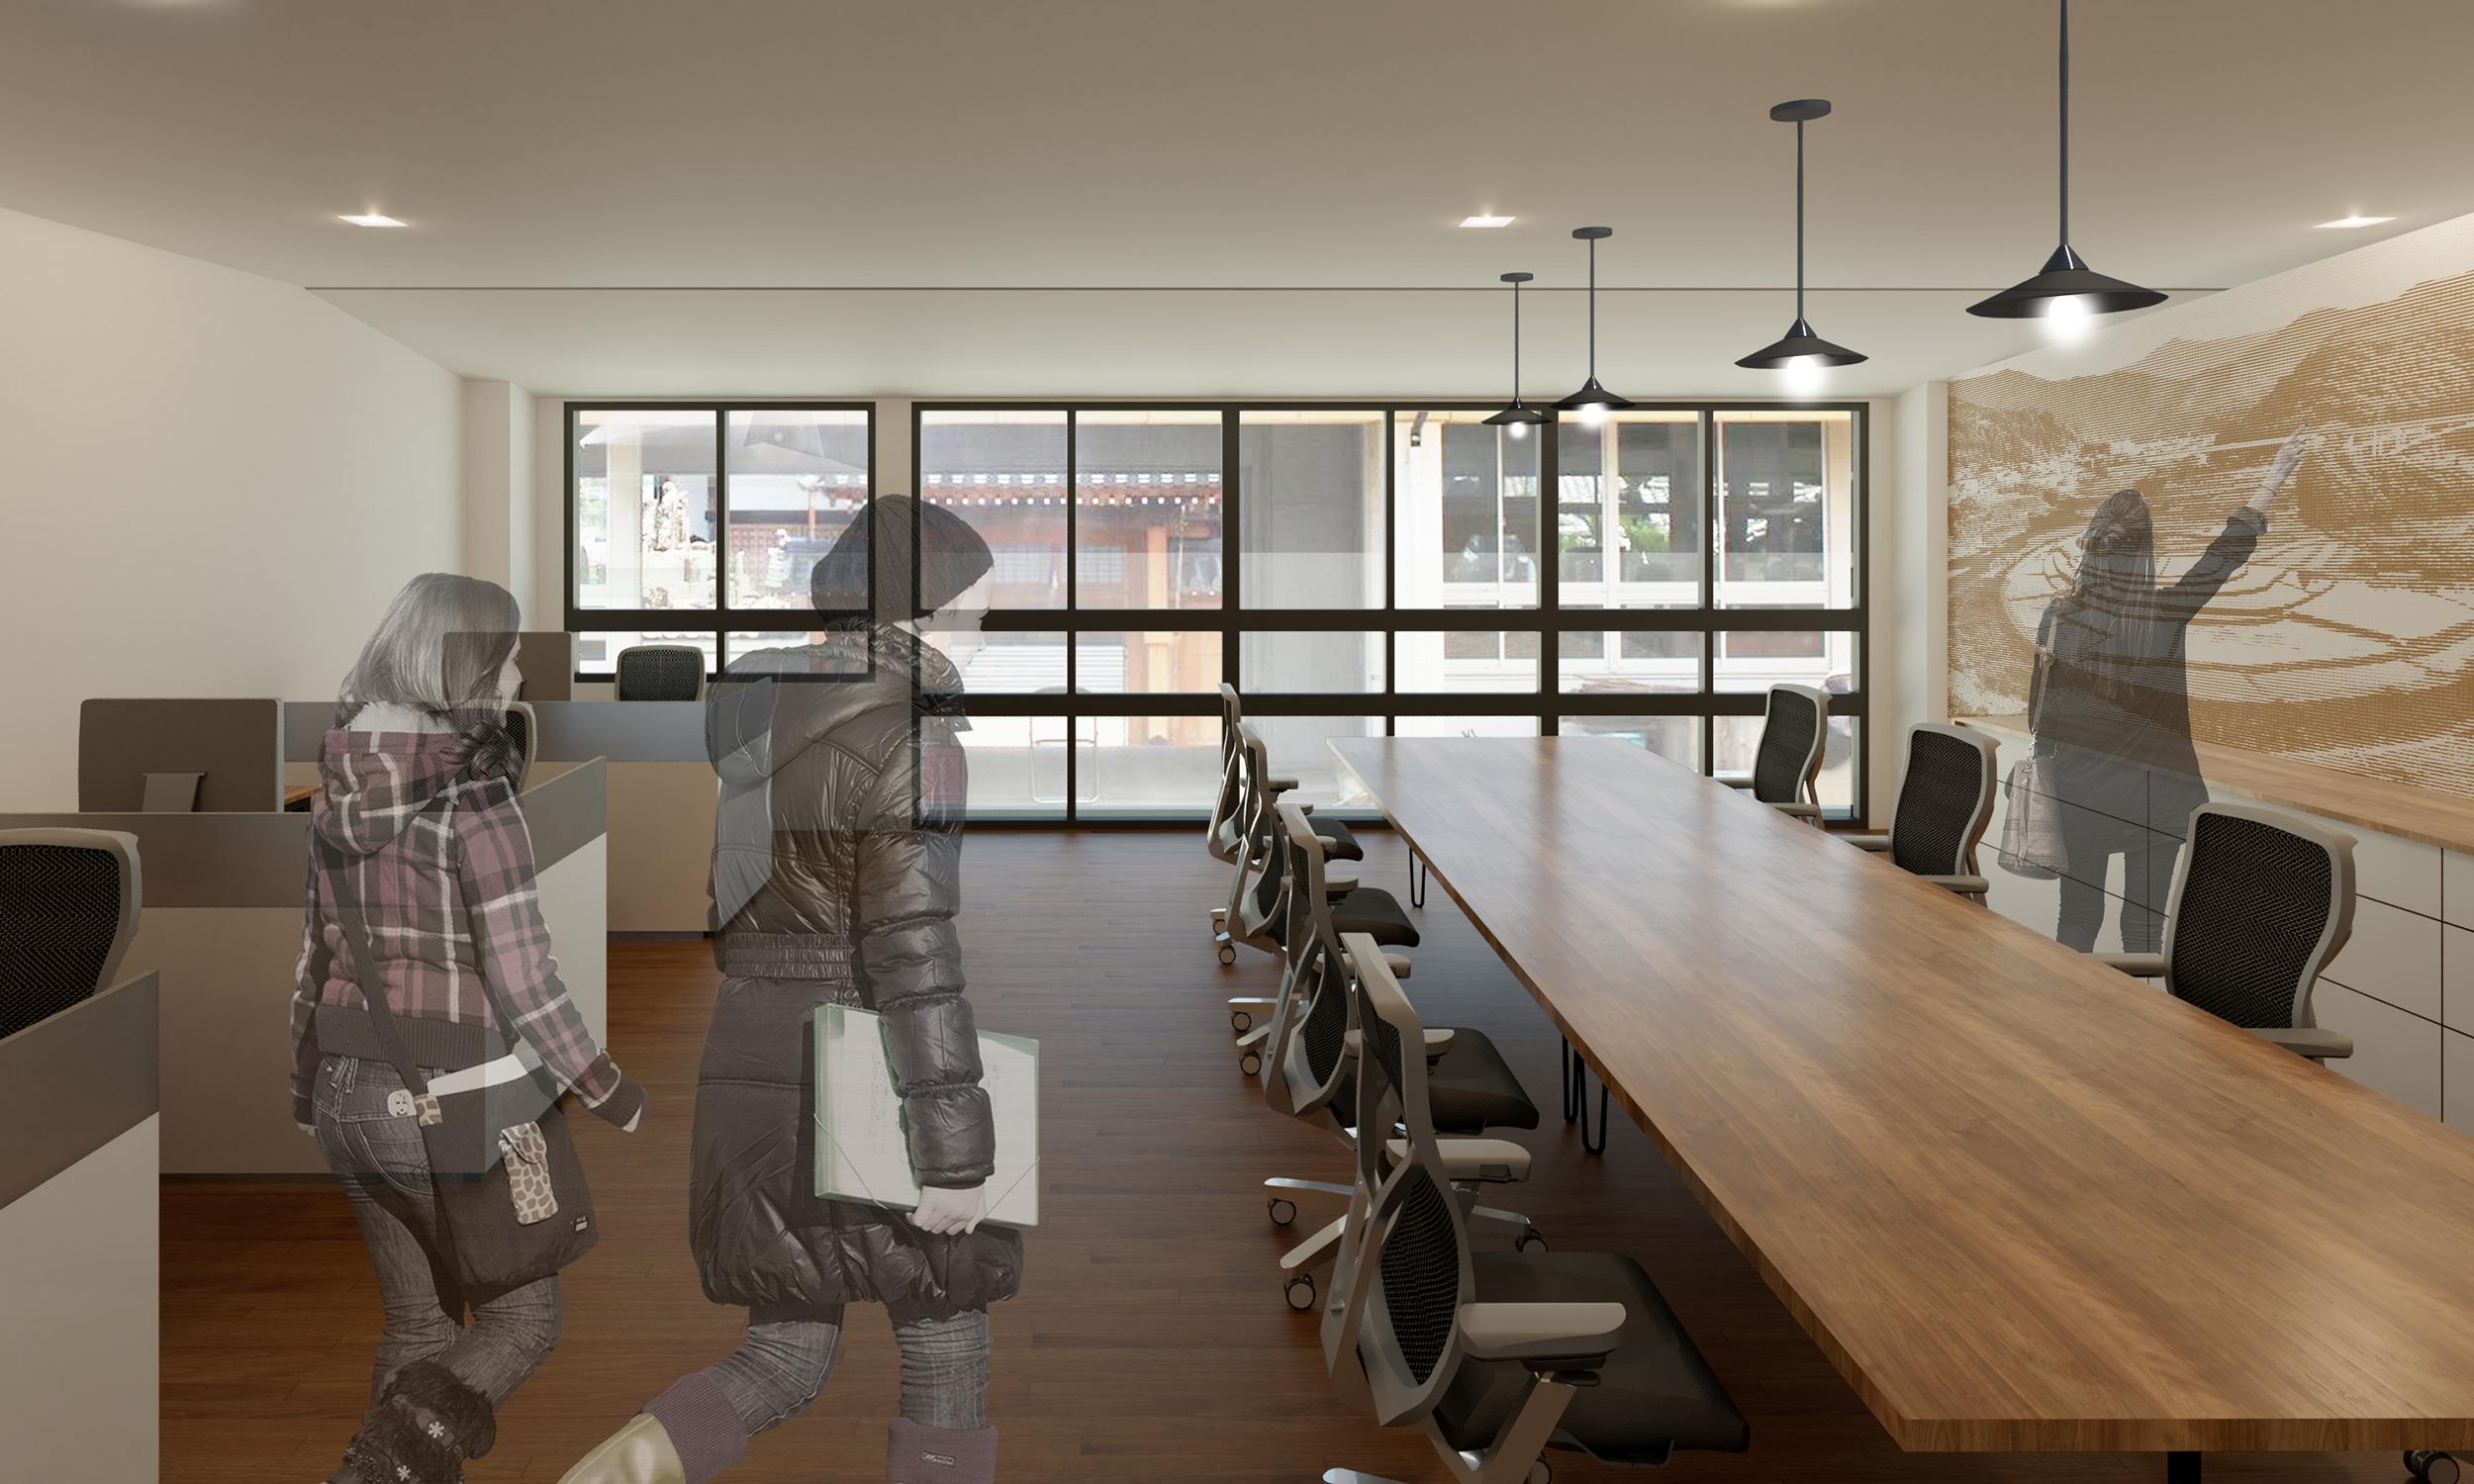 VIEW-INSIDE-SHARED-OFFICE.jpg